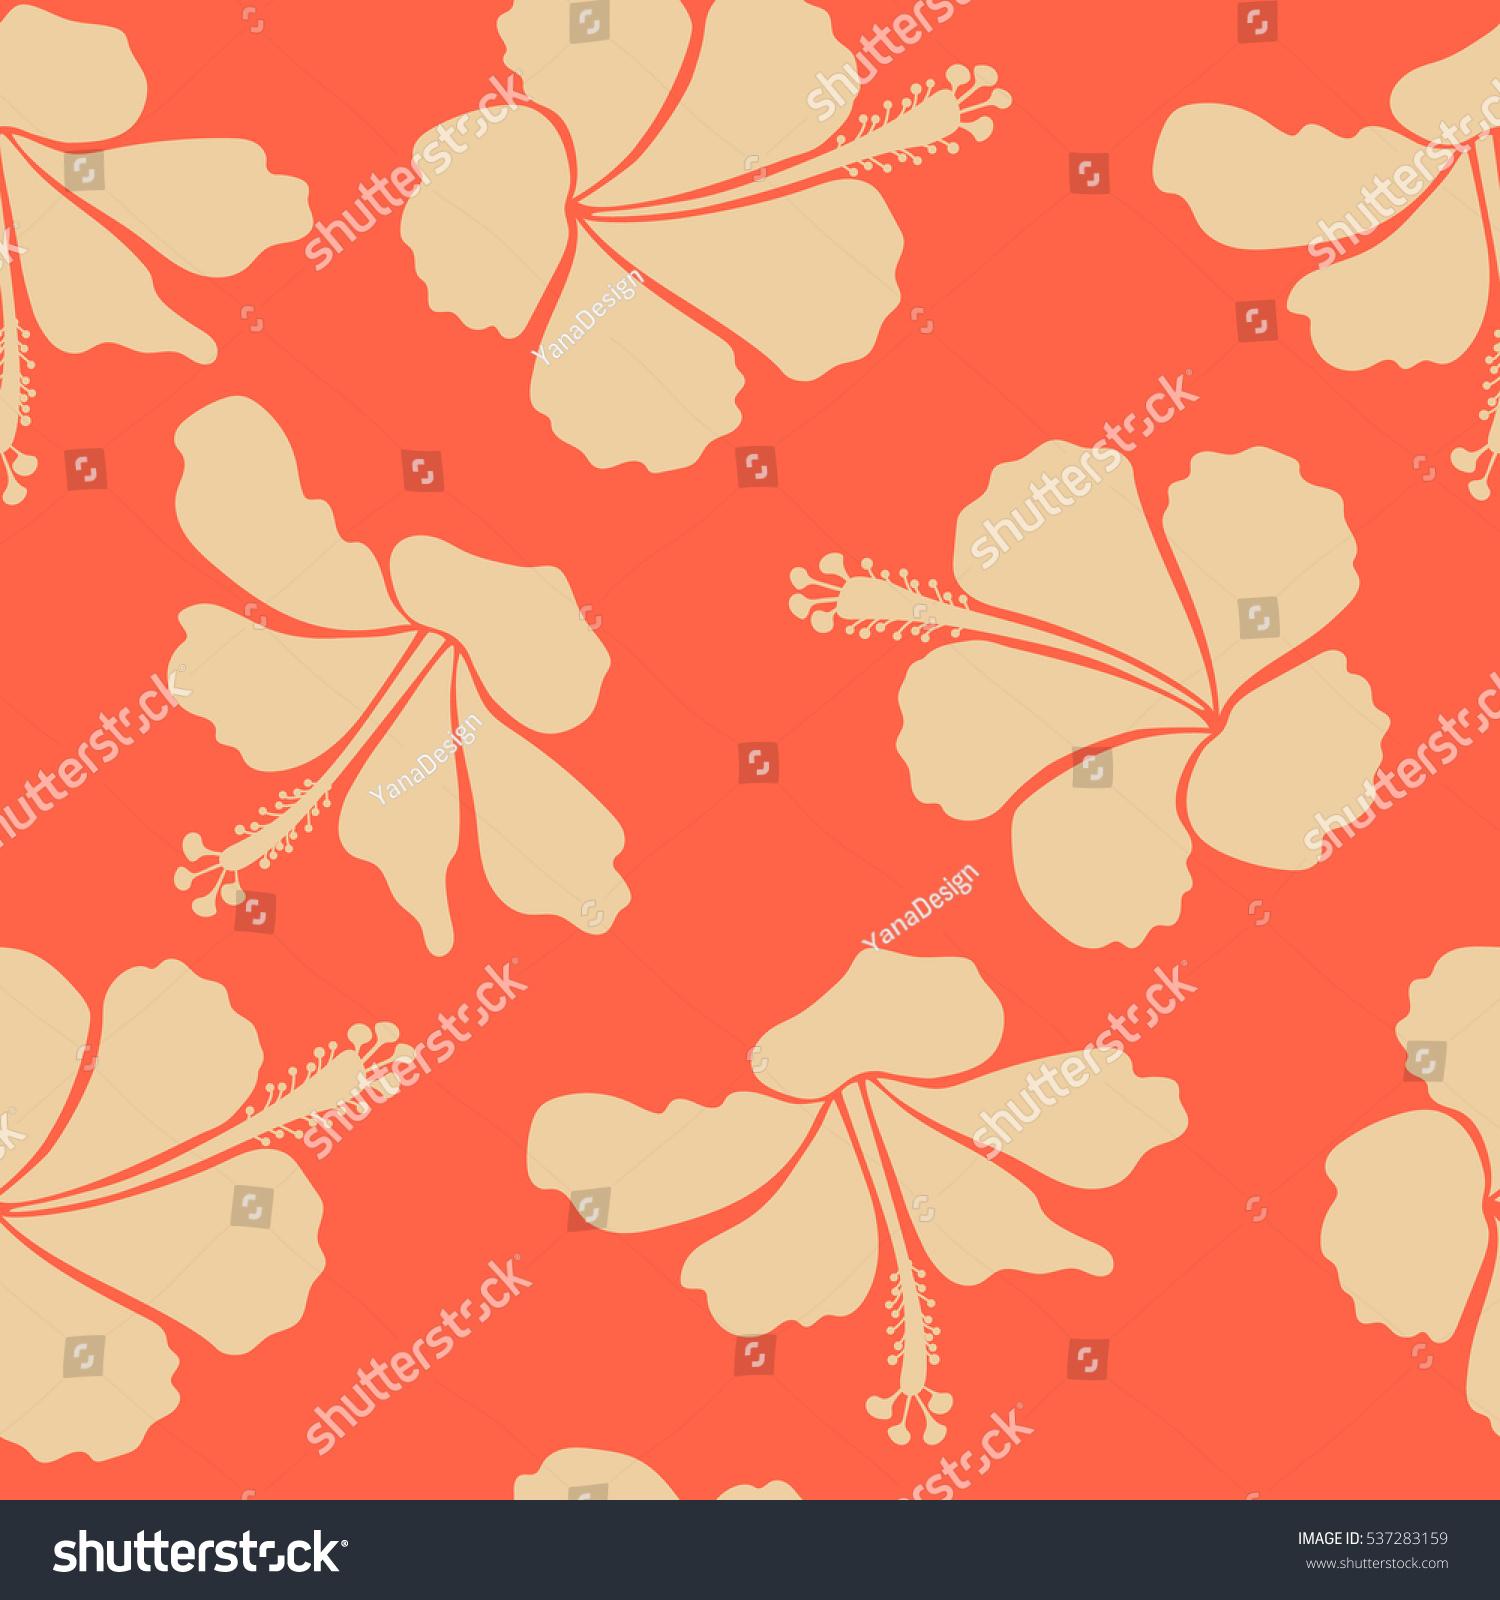 Aloha T Shirt Design Aloha Hawaii Luau Stock Vector (Royalty Free ...